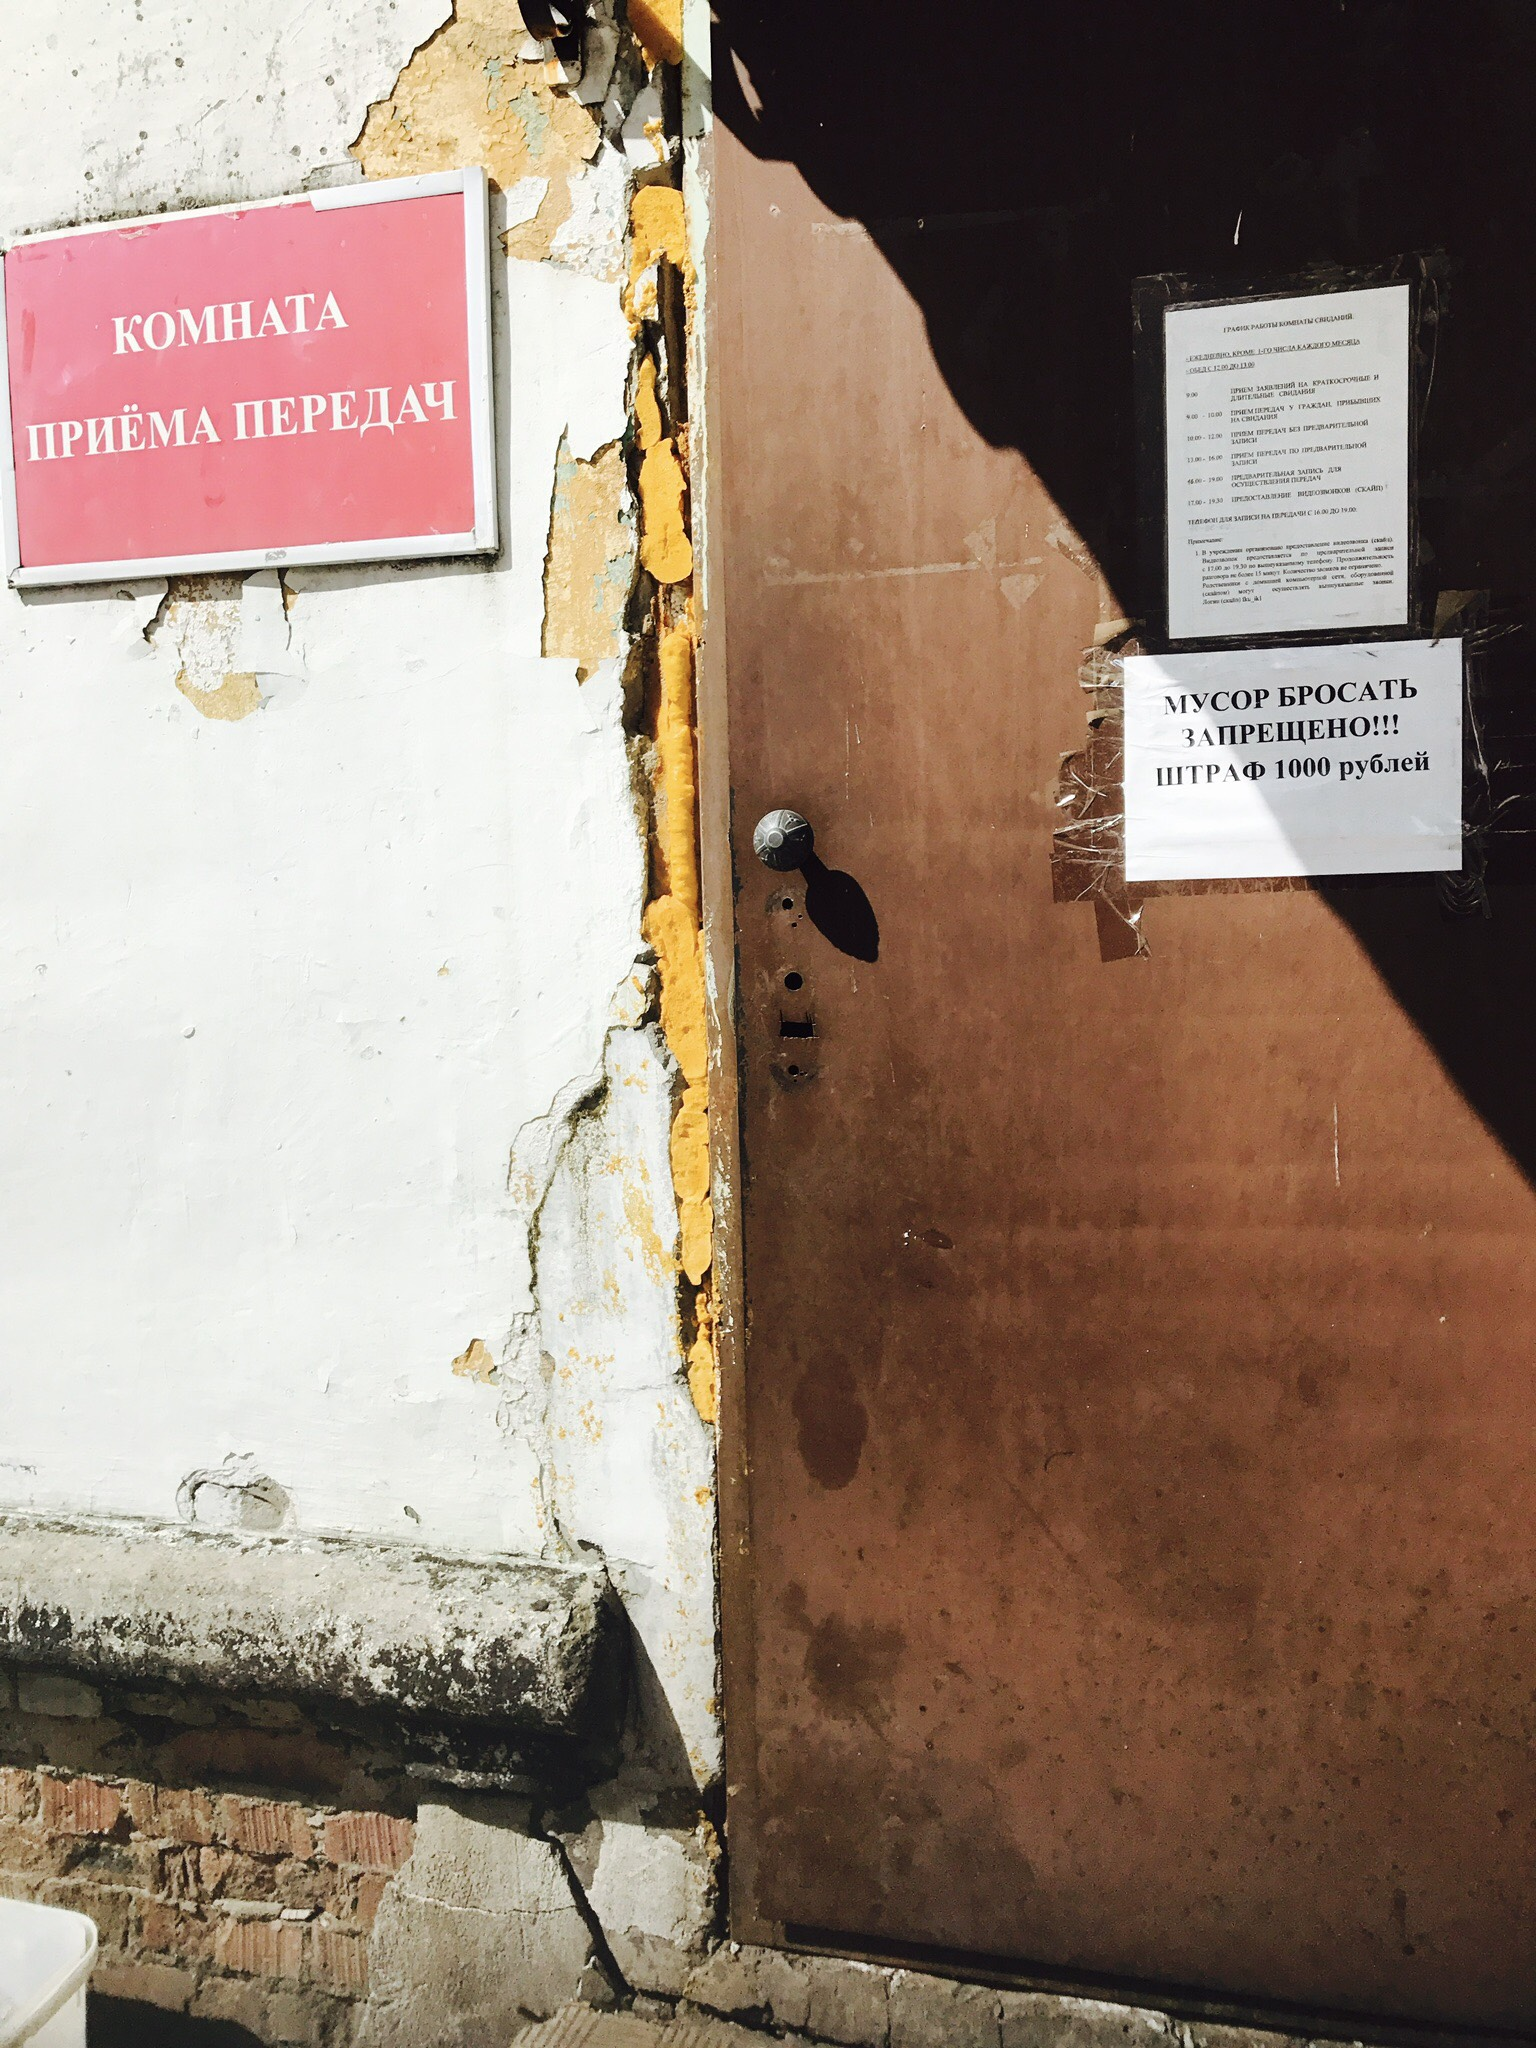 Correctional facility 1 (IK-1) of Yaroslav region, entrance to the transfer reception room. Photo:Irina Biryukova, barrister working with the Public Verdict, summer 2017